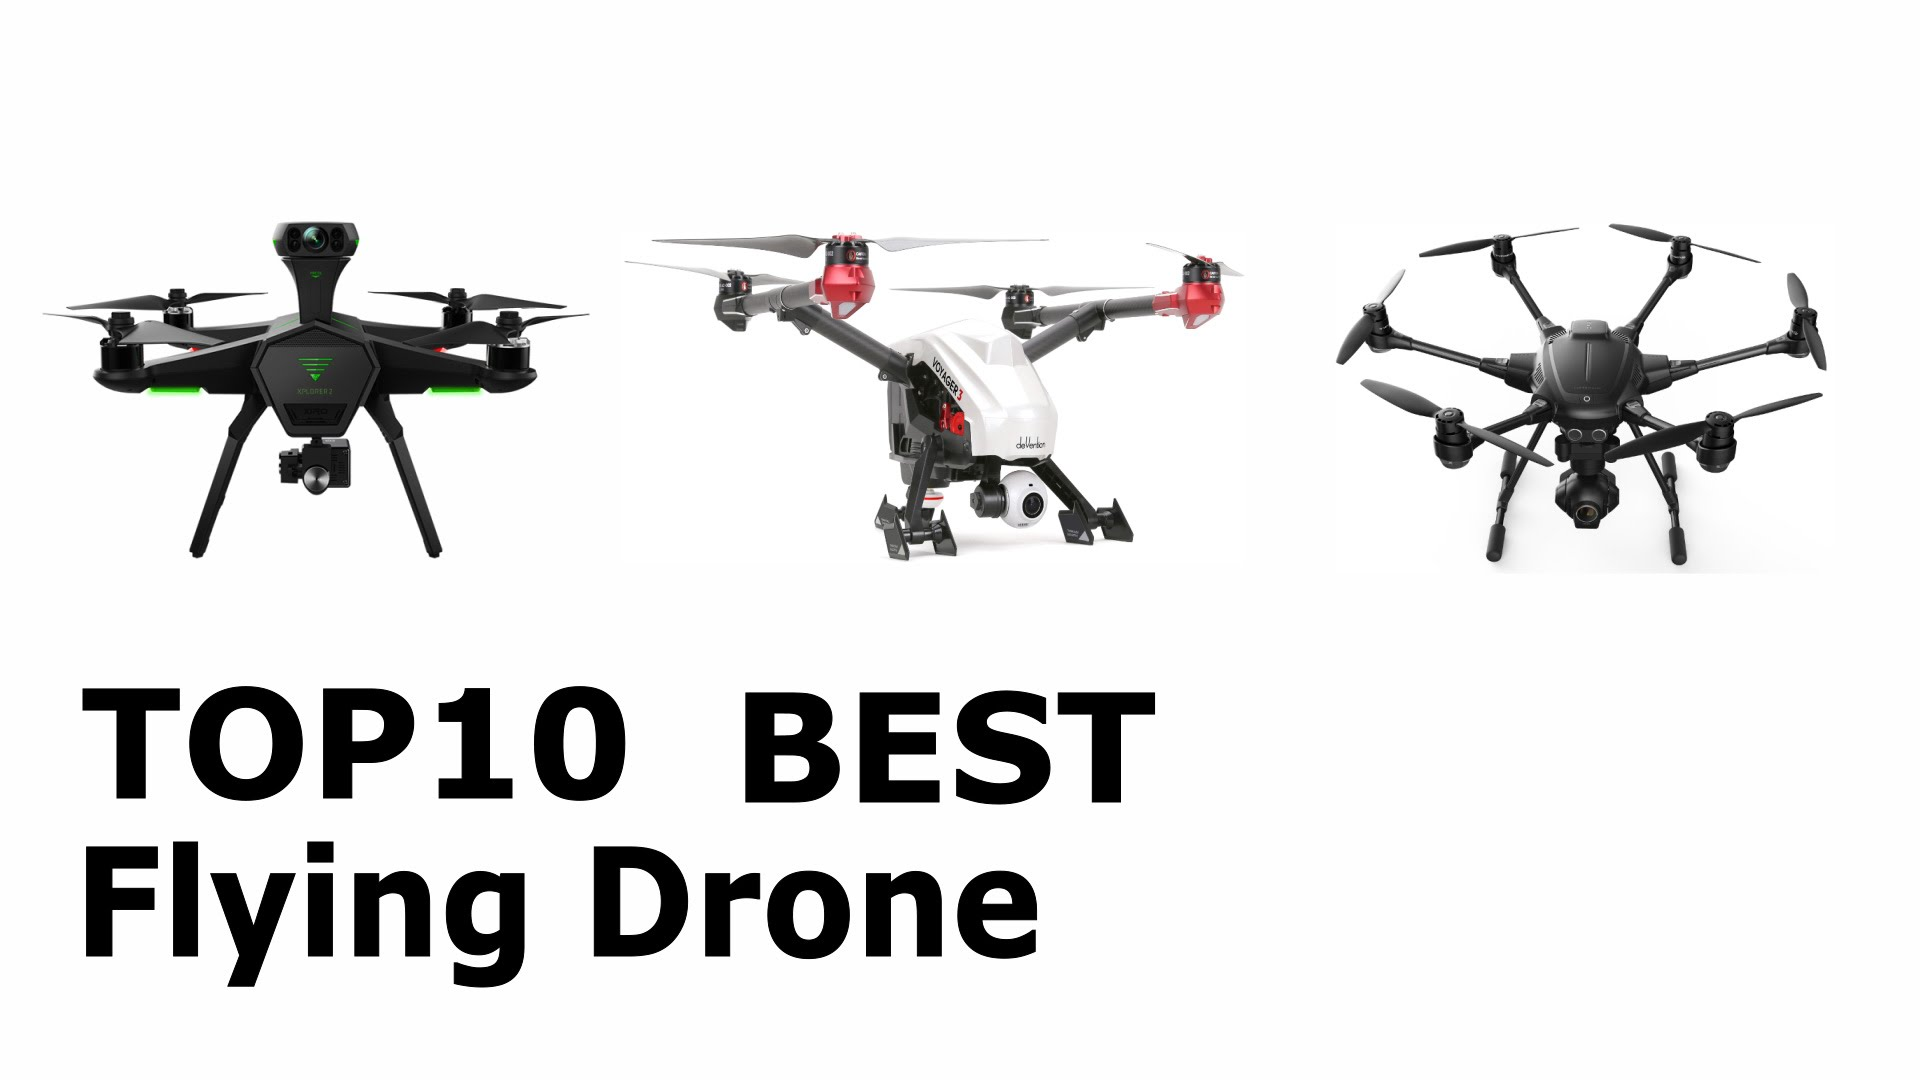 Top 10 Best Drone